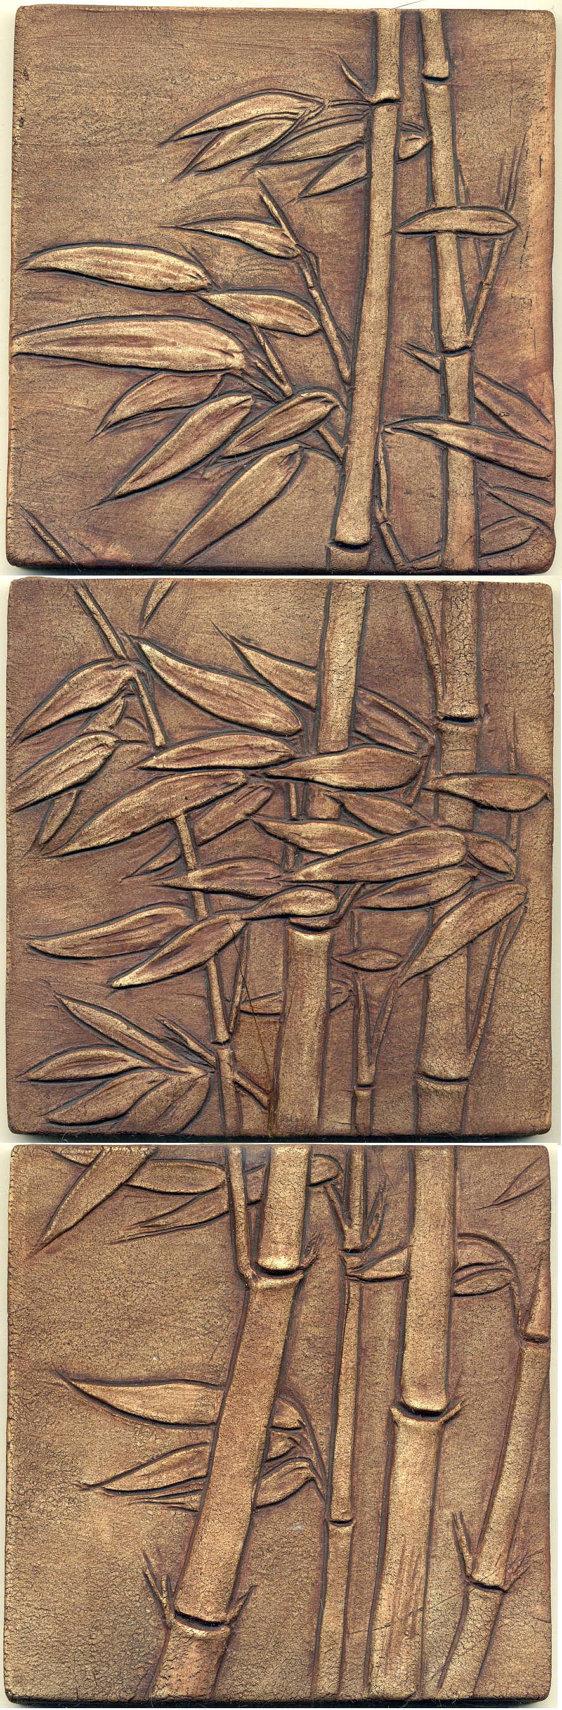 Asian style Windblown Bamboo Tiles Set of 3 by RavenstoneTiles, $59.00